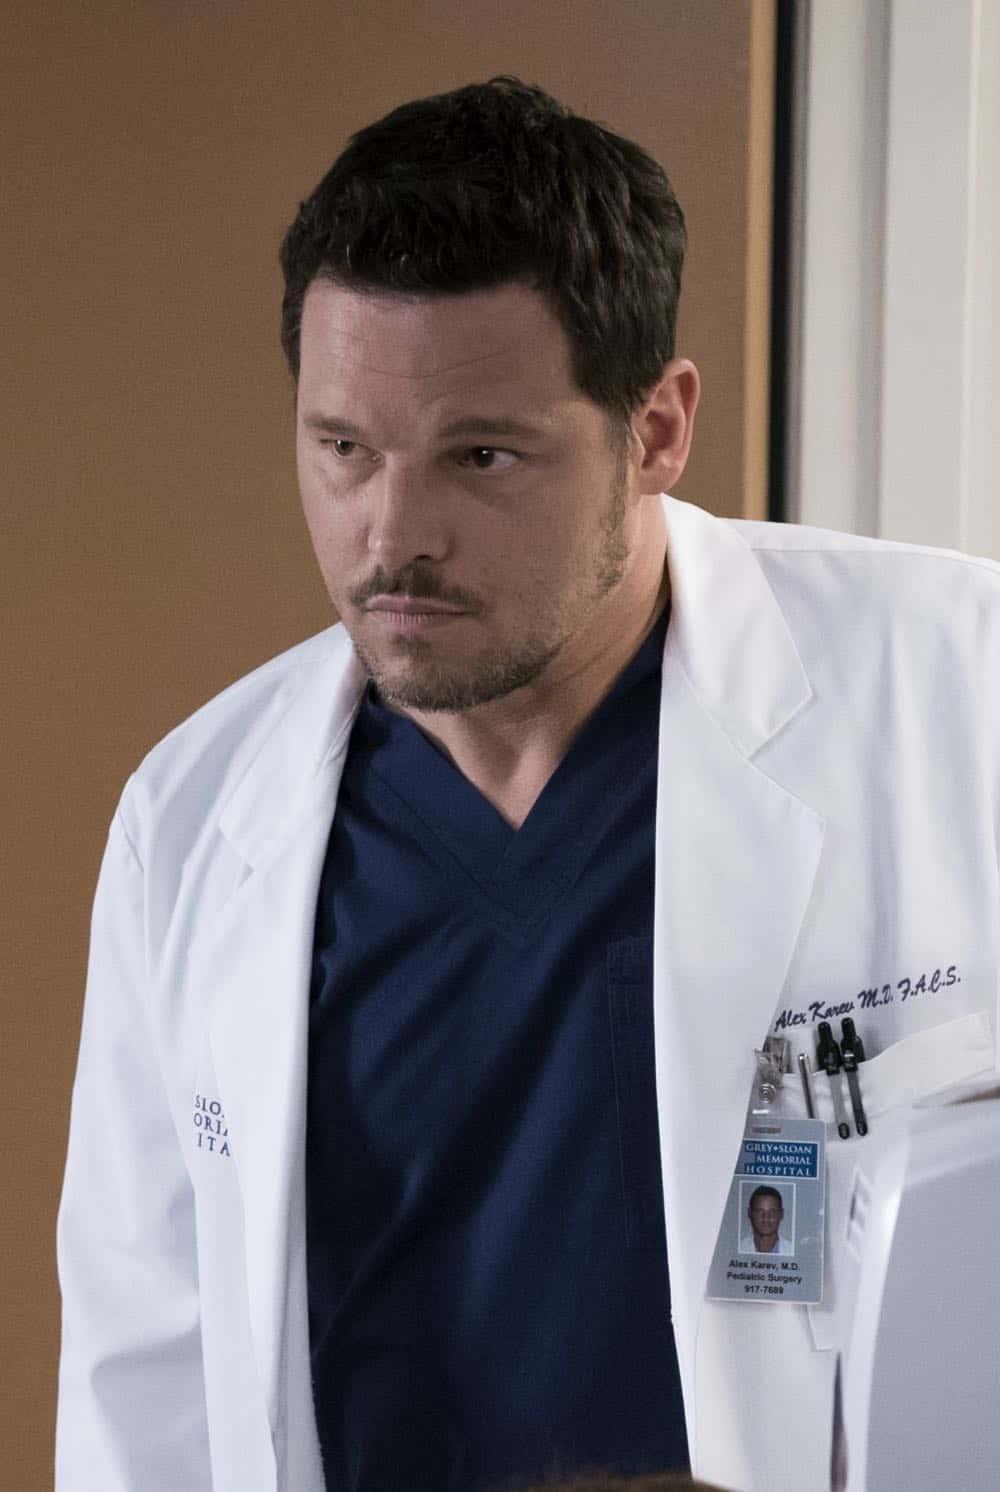 Greys Anatomy Episode 21 Season 14 Bad Reputation 02